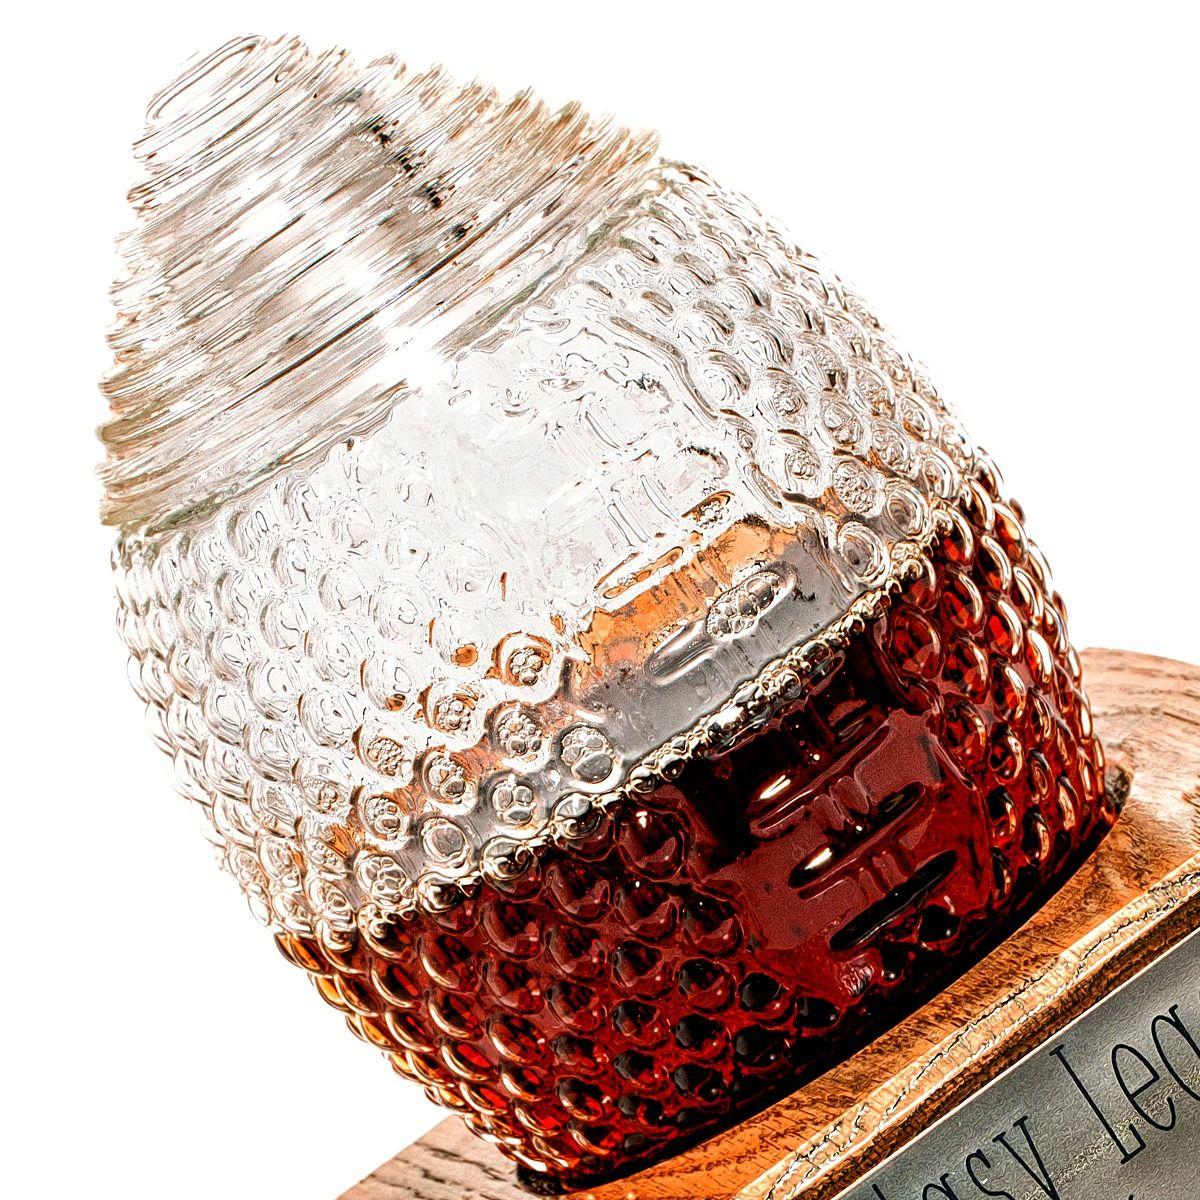 Closeup Fantasy Football Trophy decanter